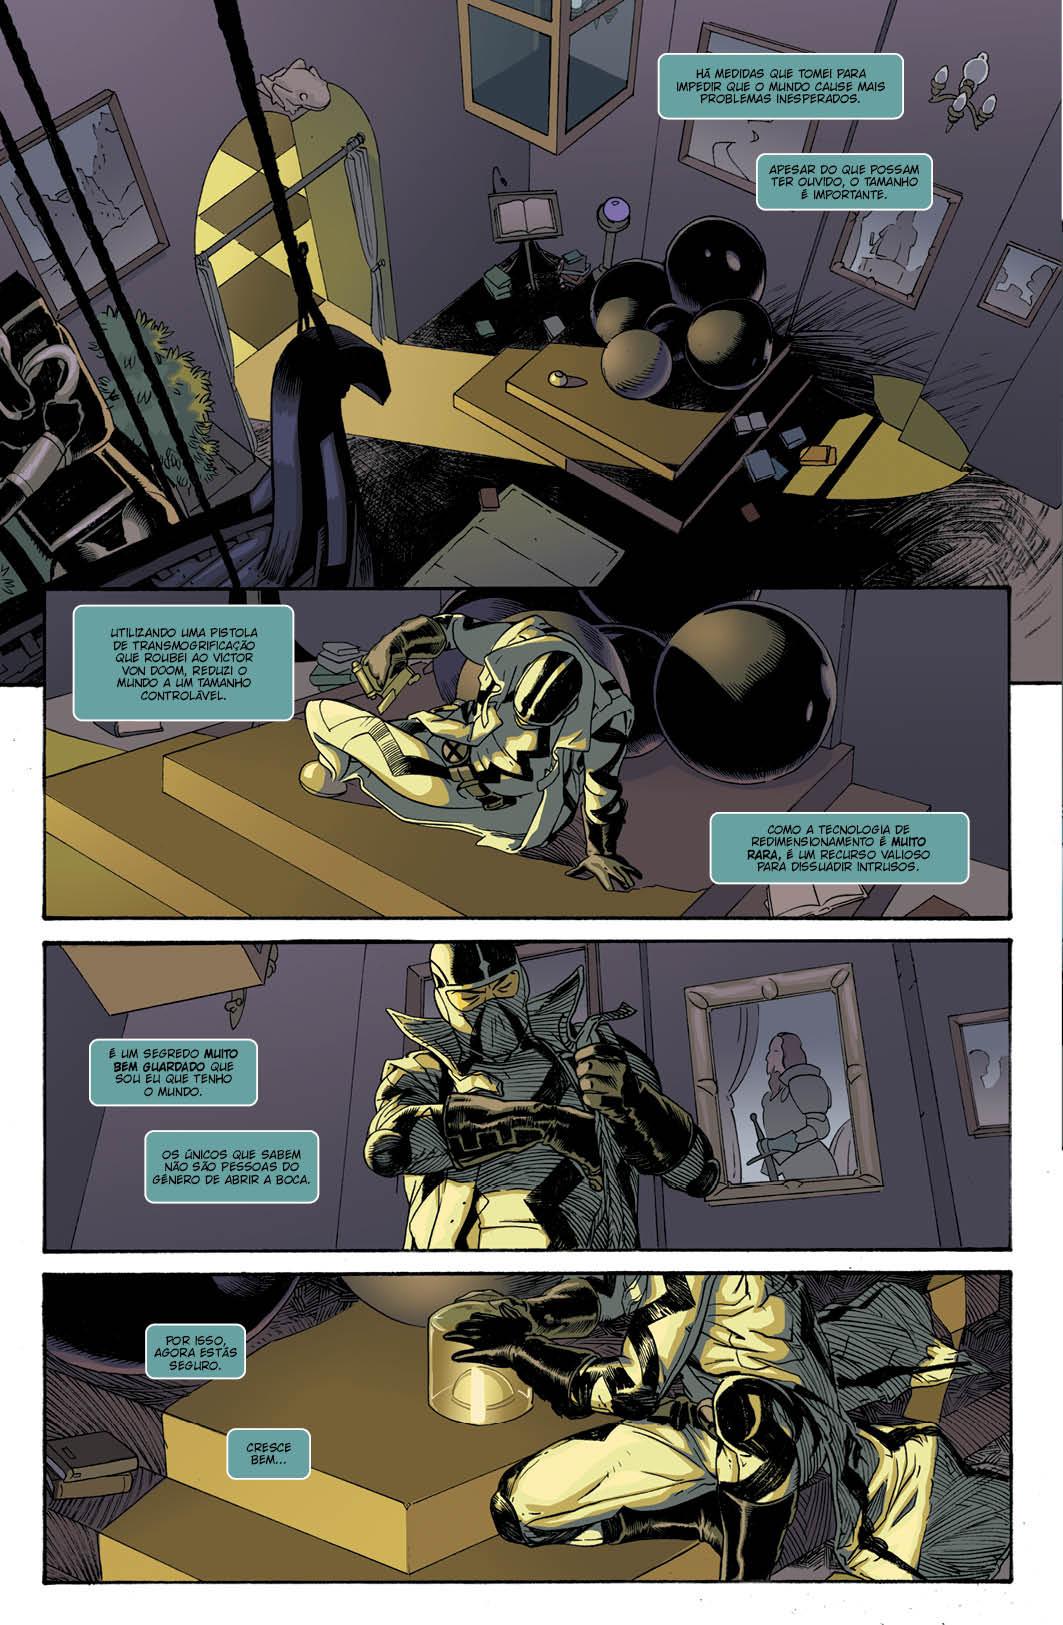 UNCANNY X-FORCE Vol. 1: A SOLUÇÃO APOCALIPSE